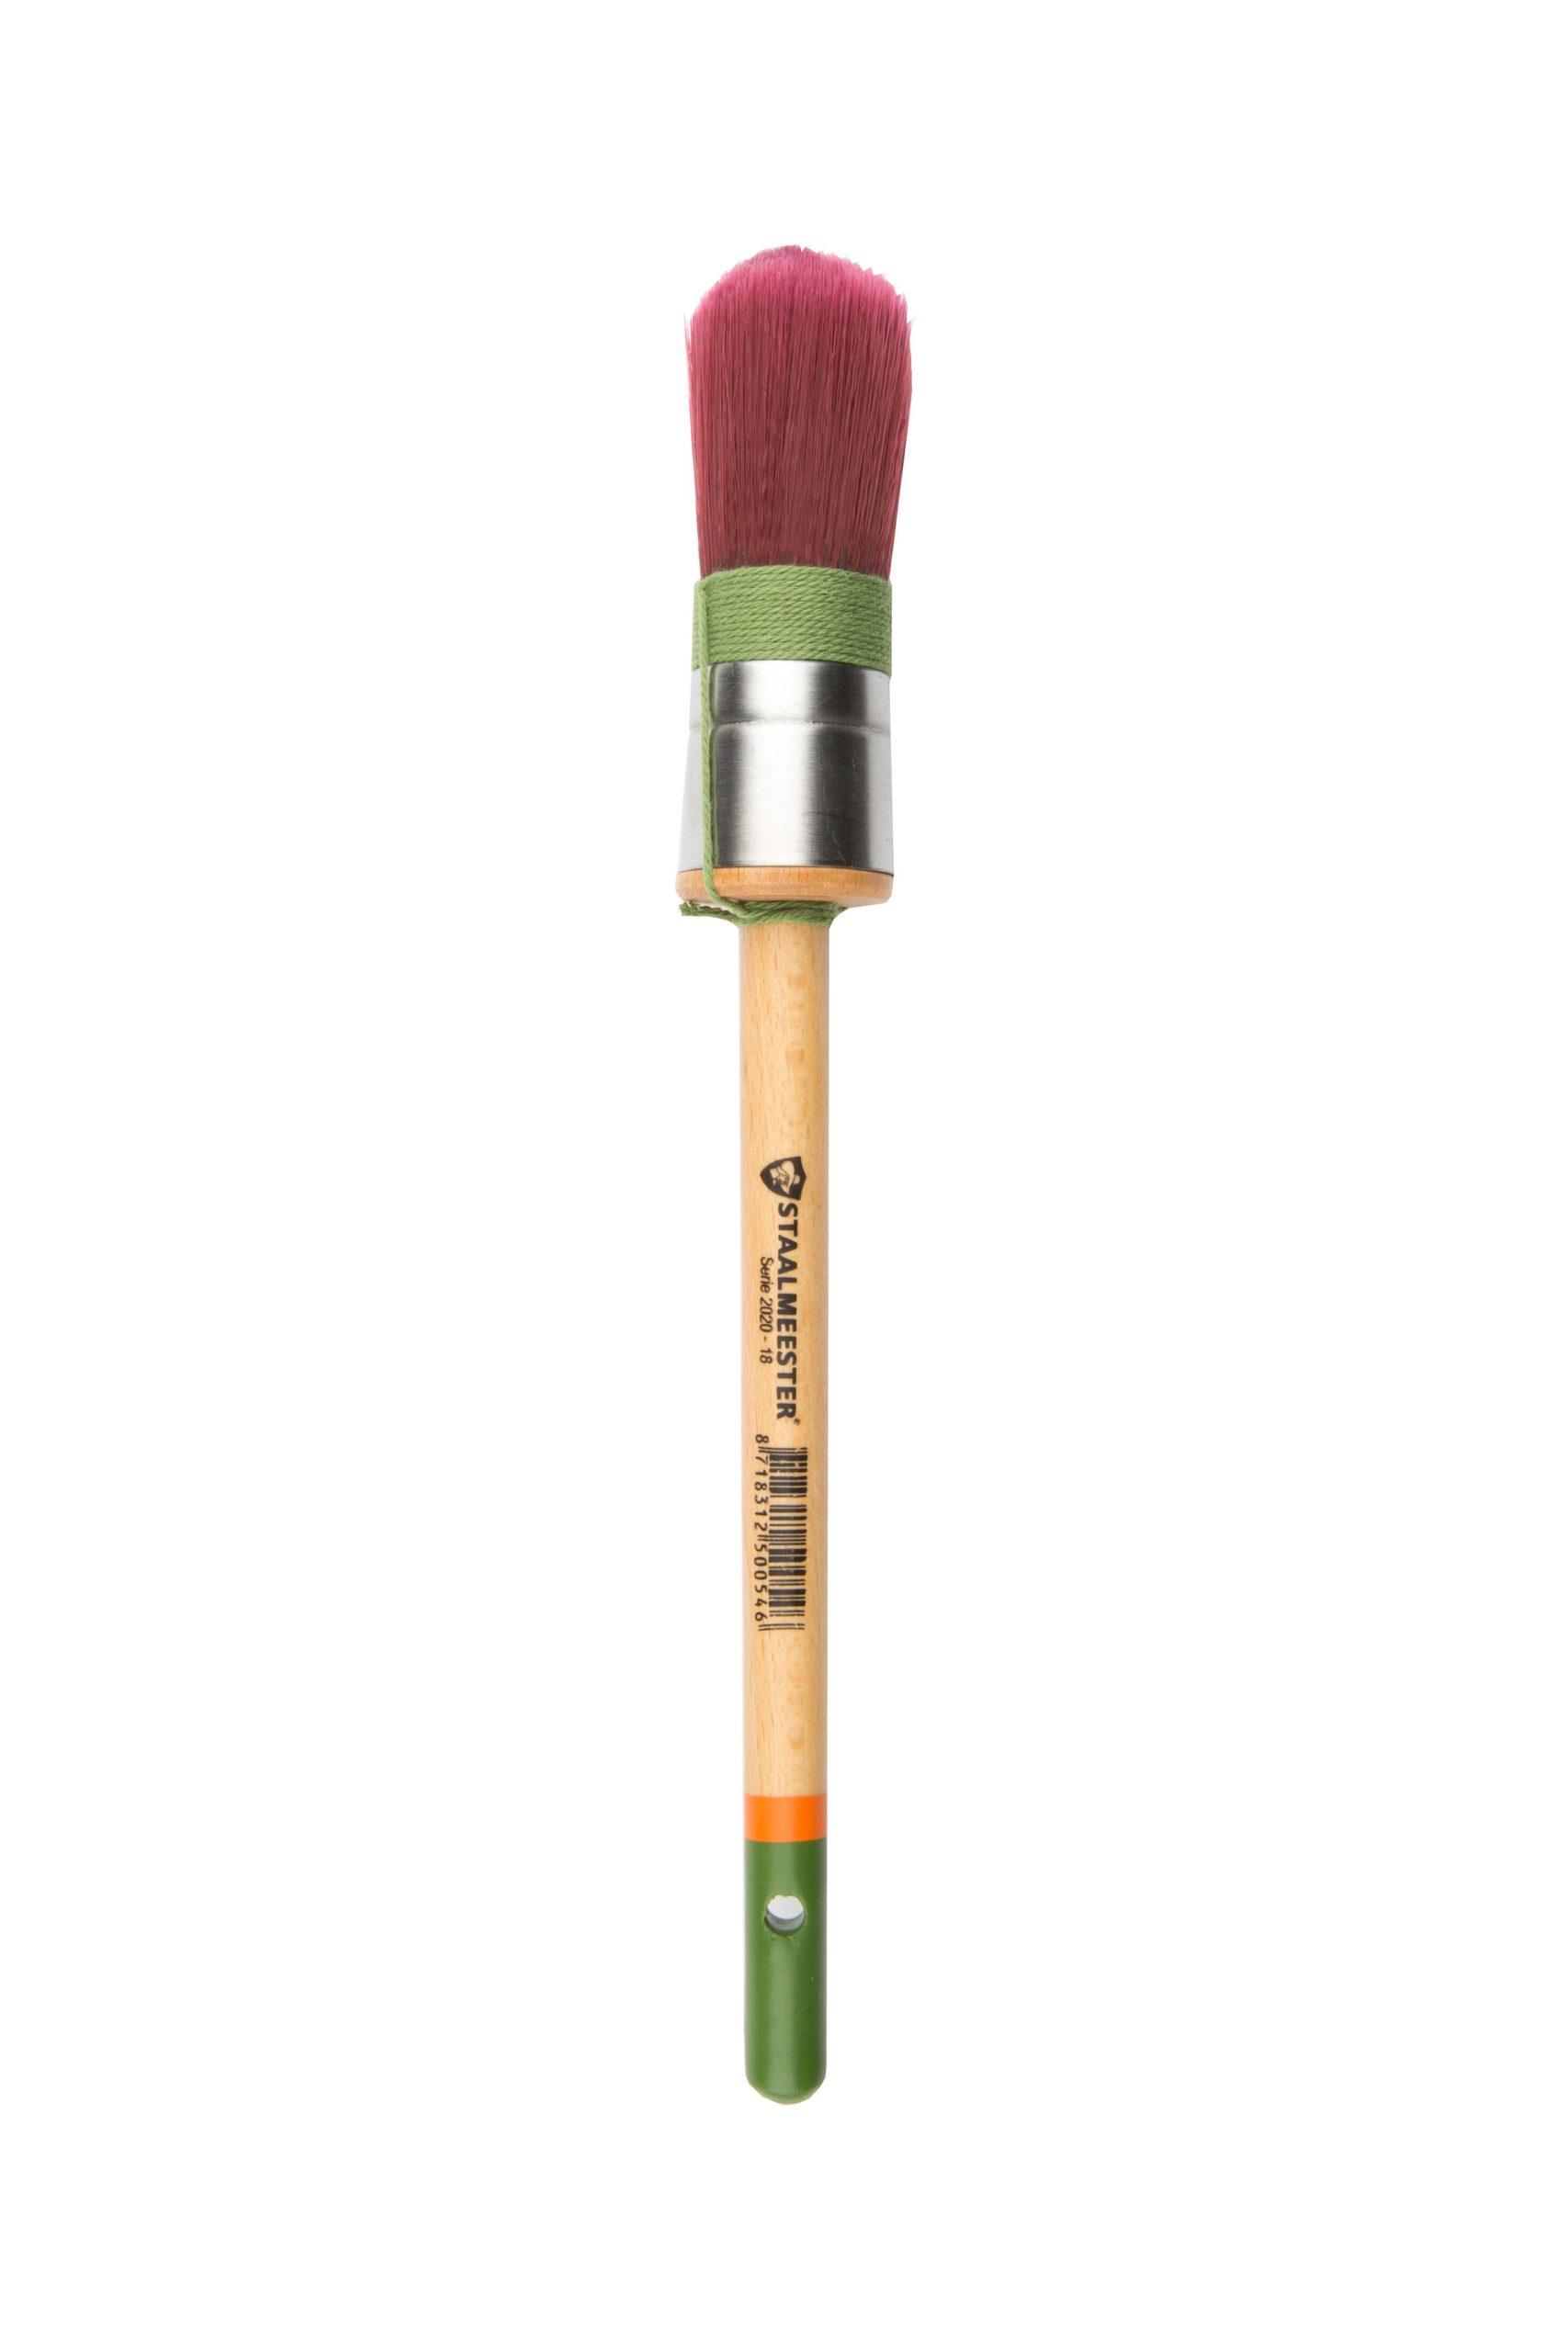 Staalmeester Premium Brush - Round Synthetic #18 1